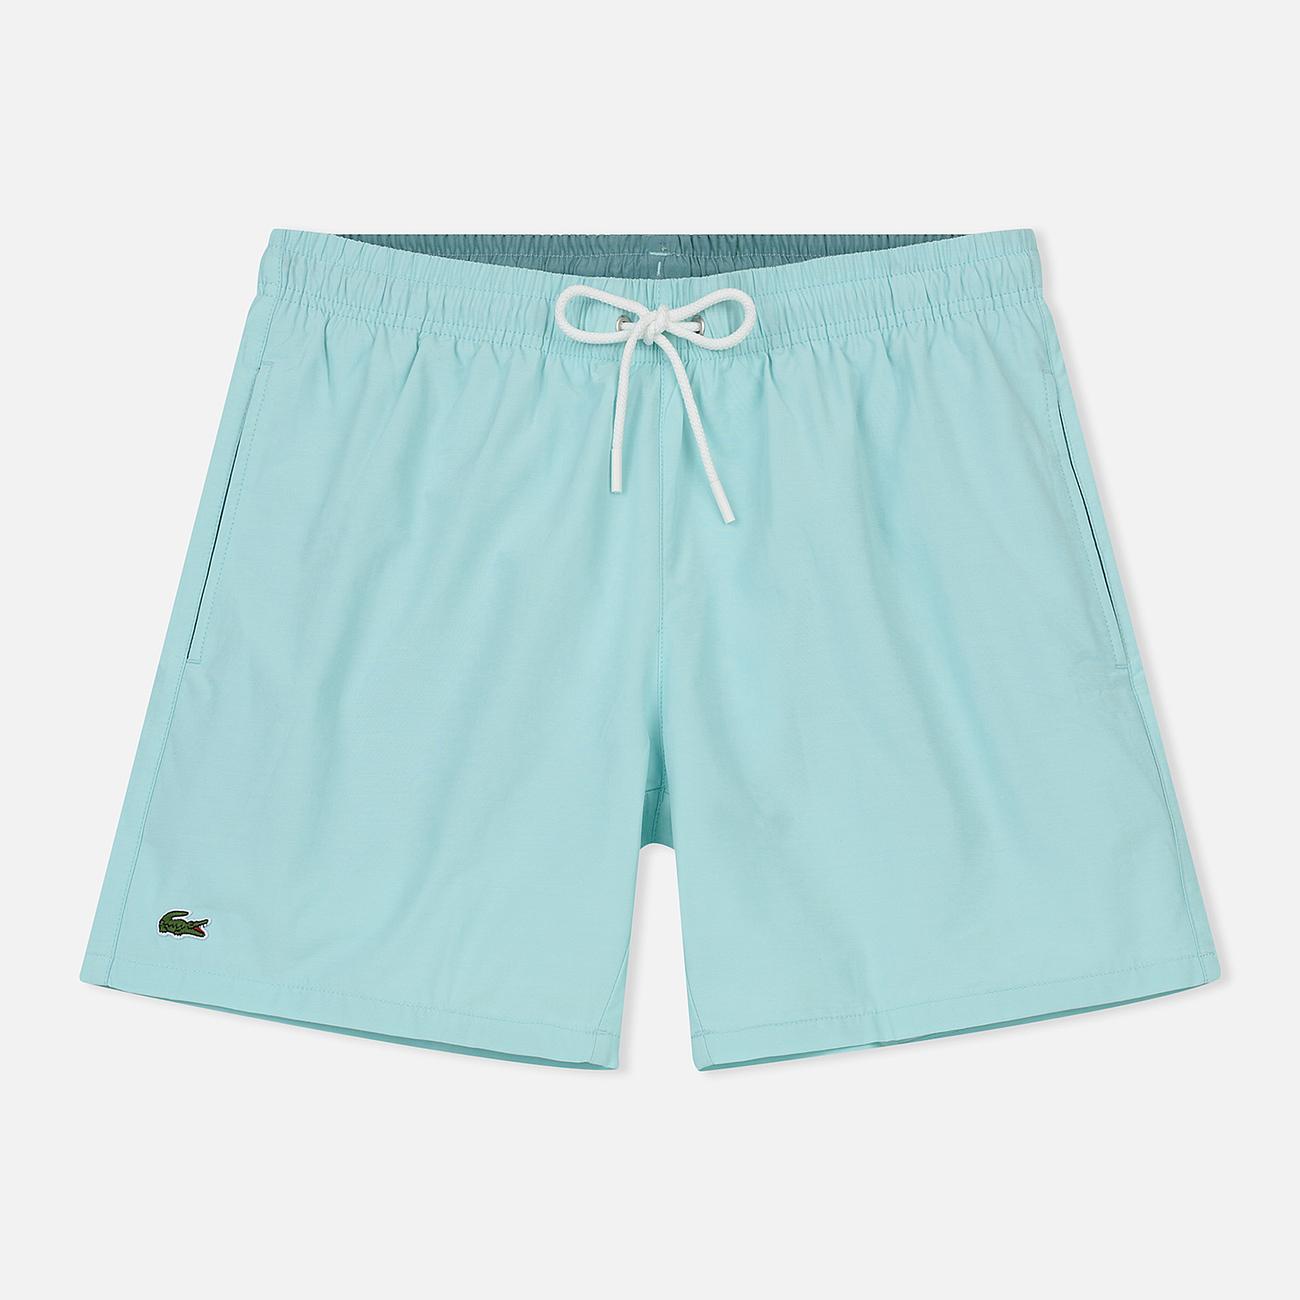 Мужские шорты Lacoste Taffeta Swim White/Blue